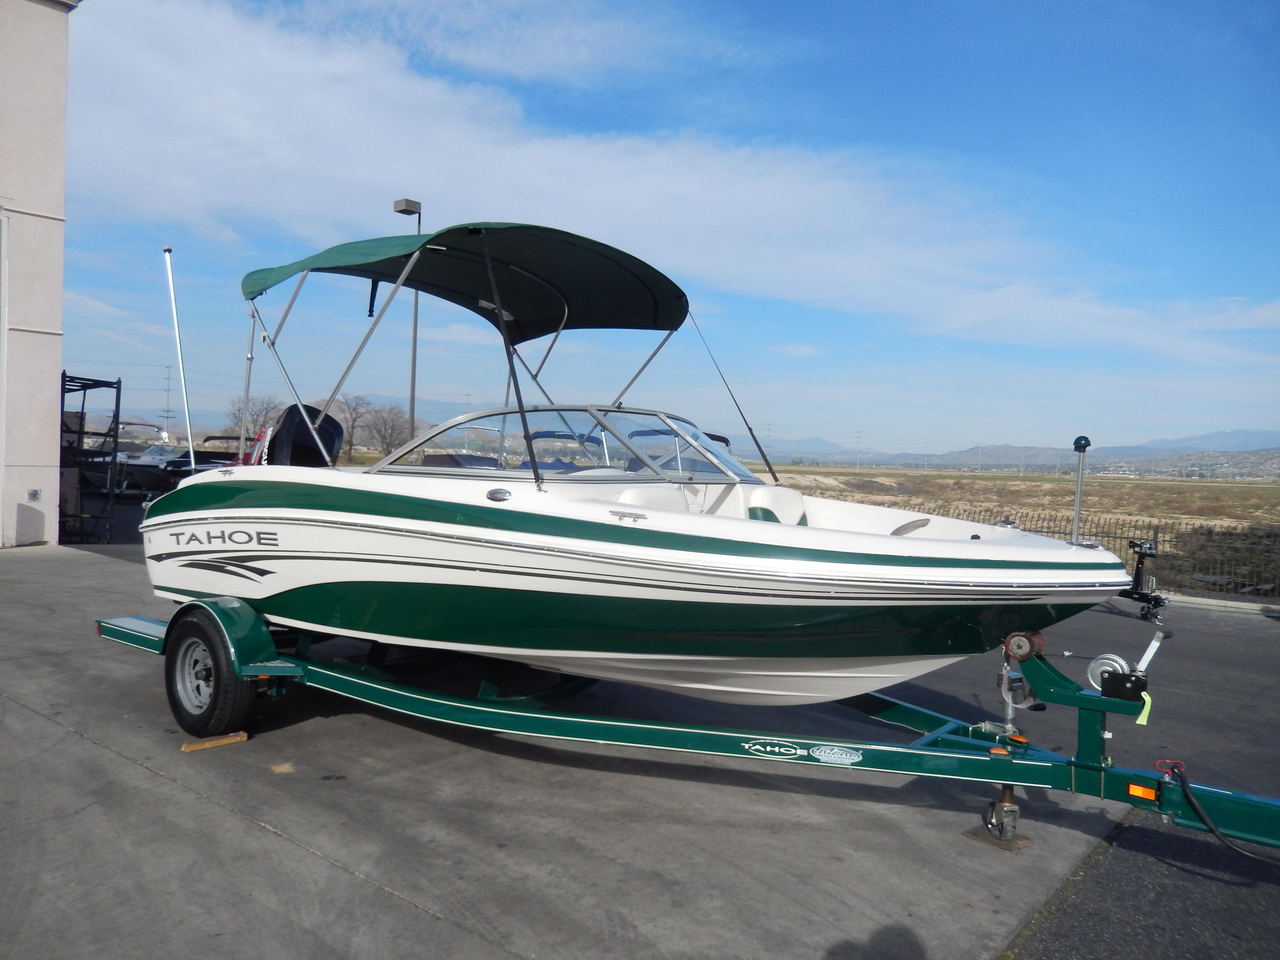 Tracker 2006 tahoe q4 fish ski autos post for Fish and ski boats for sale craigslist